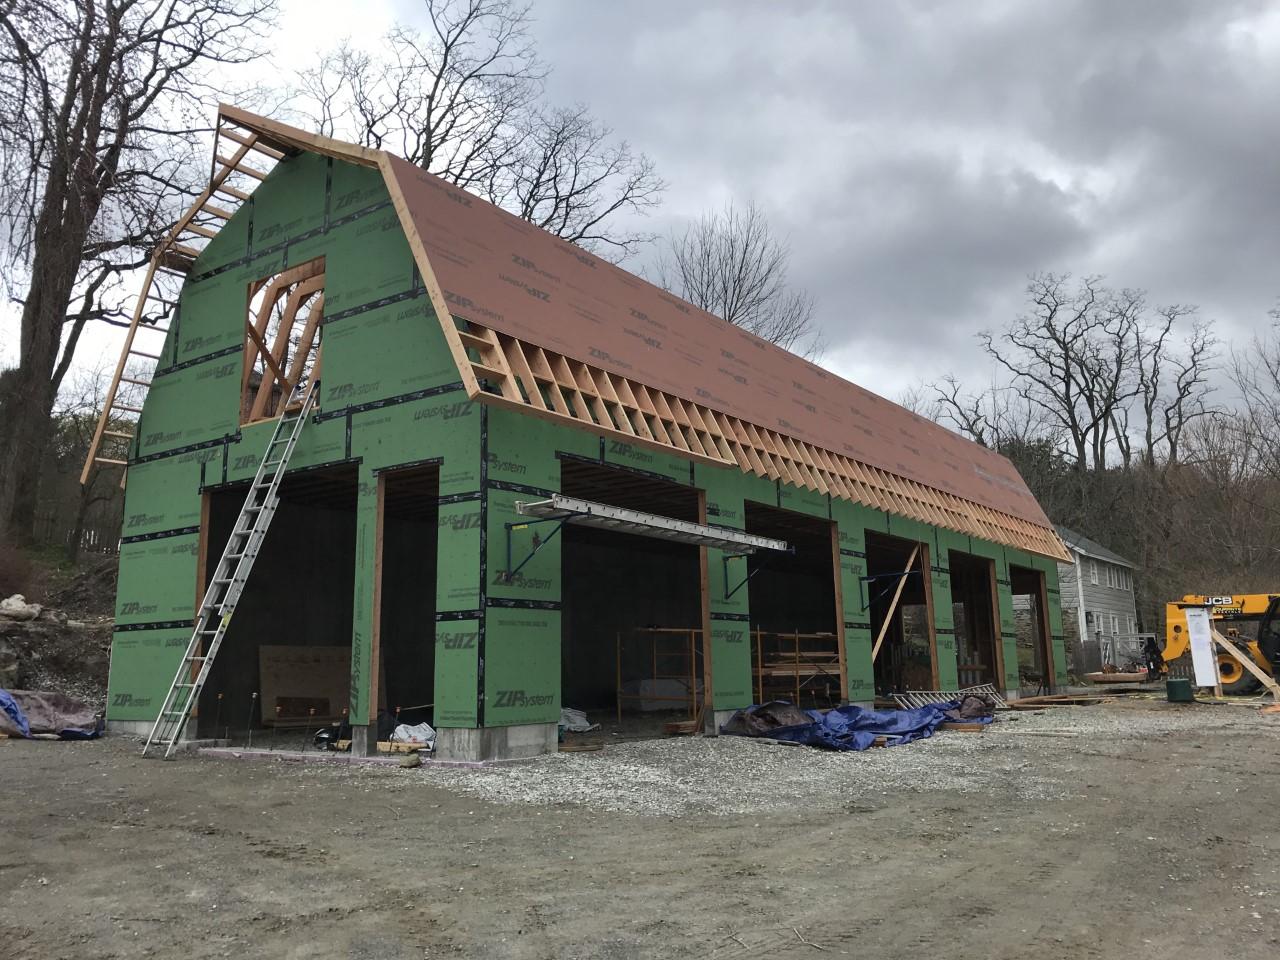 Upstate Work Barn